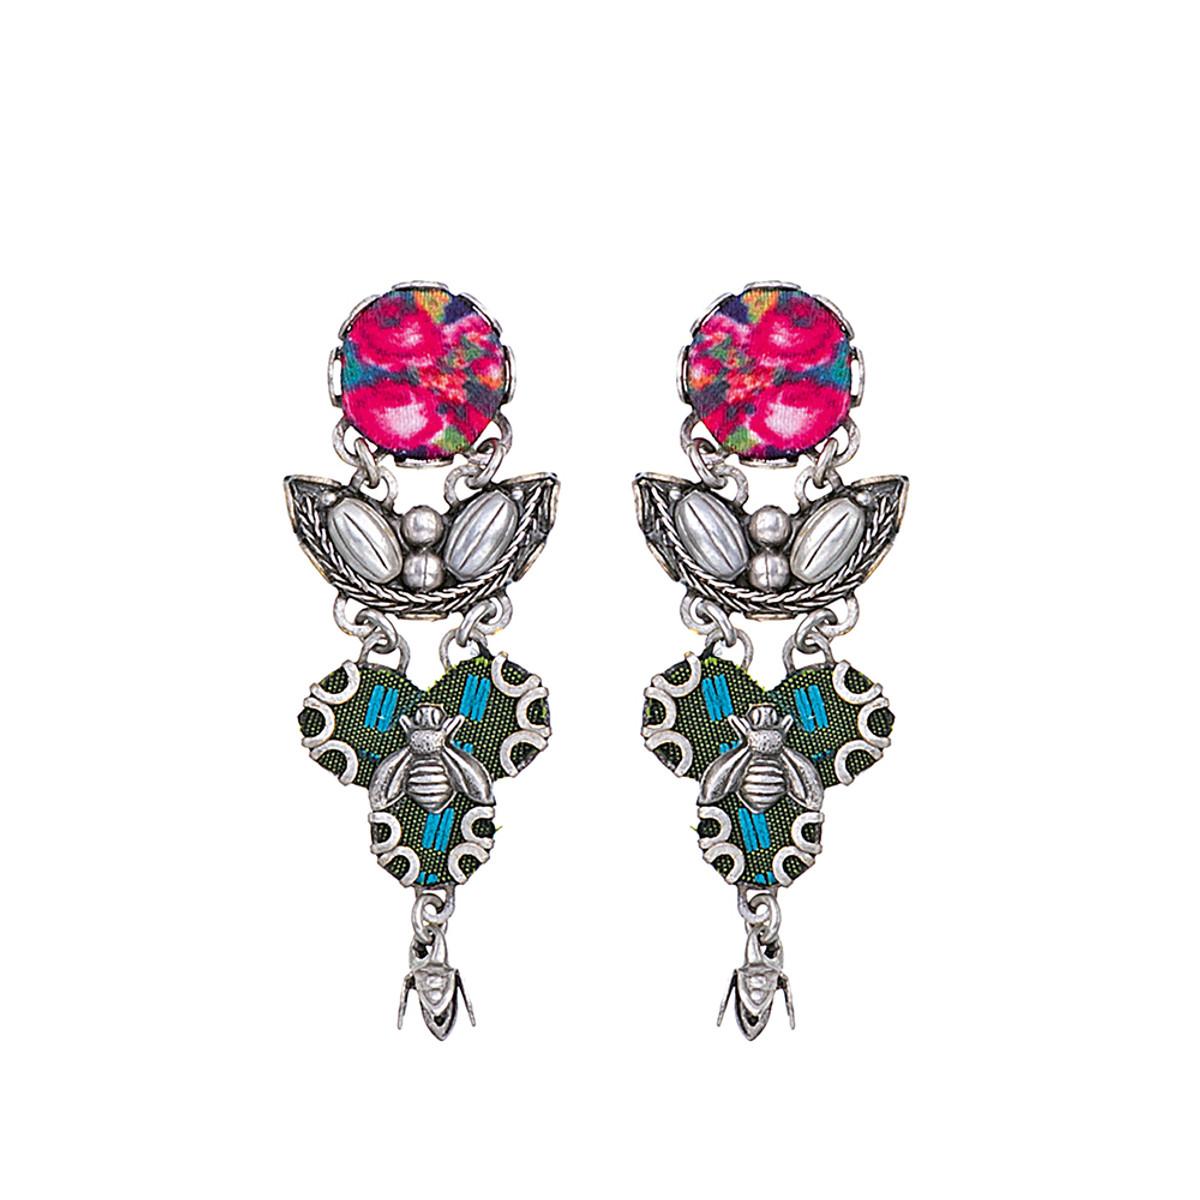 Ayala Bar Pretty in Pink Earrings